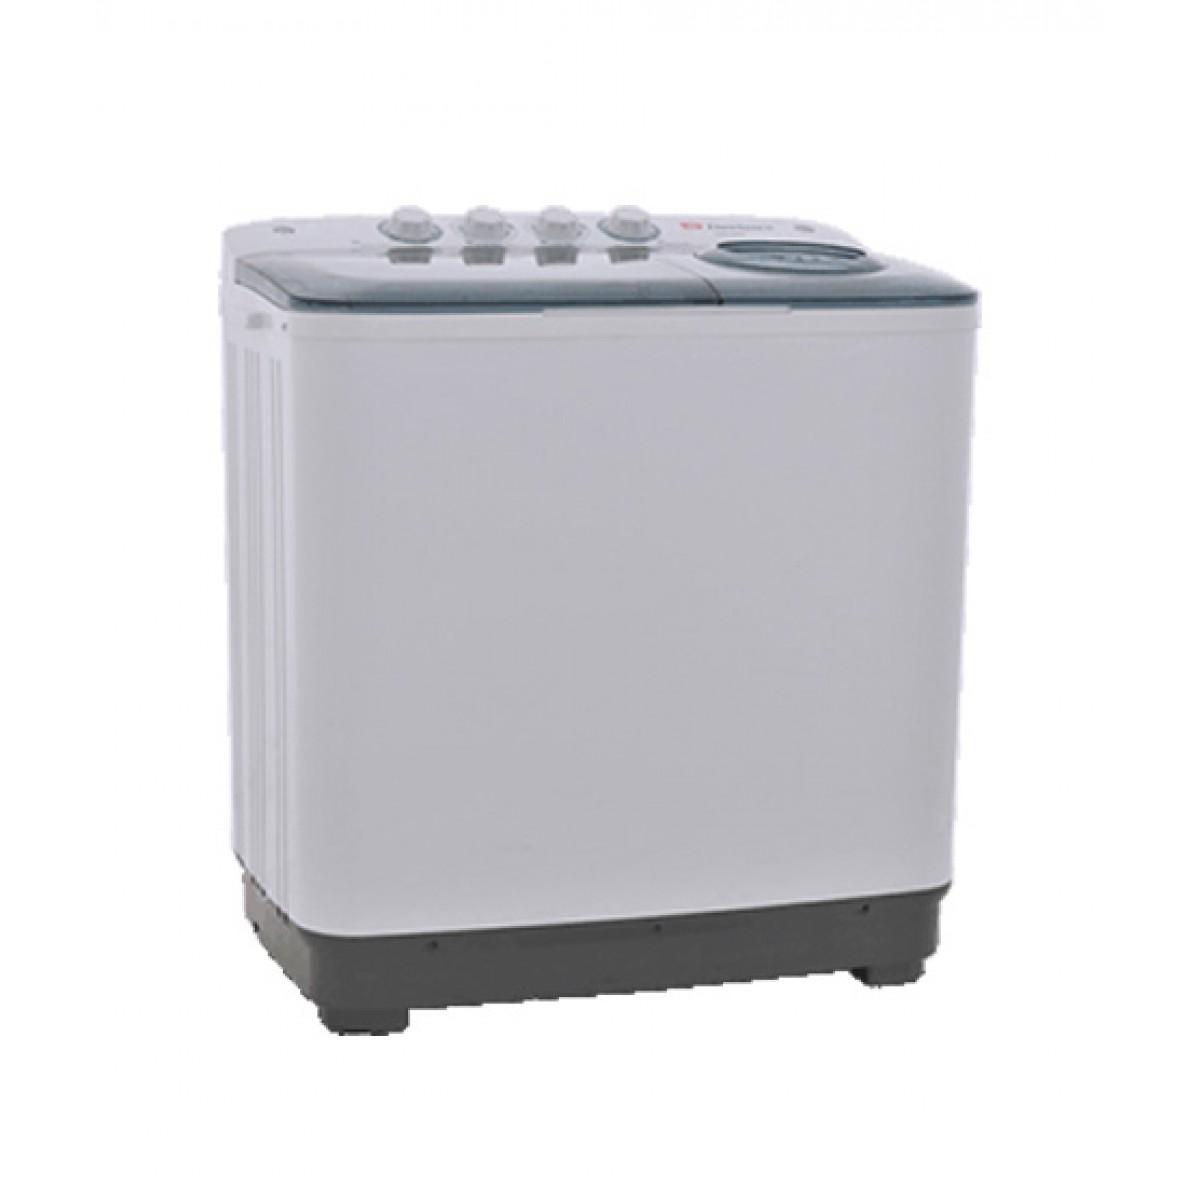 Dawlance Semi Automatic Twin Tub Washing Machine DW-140C2